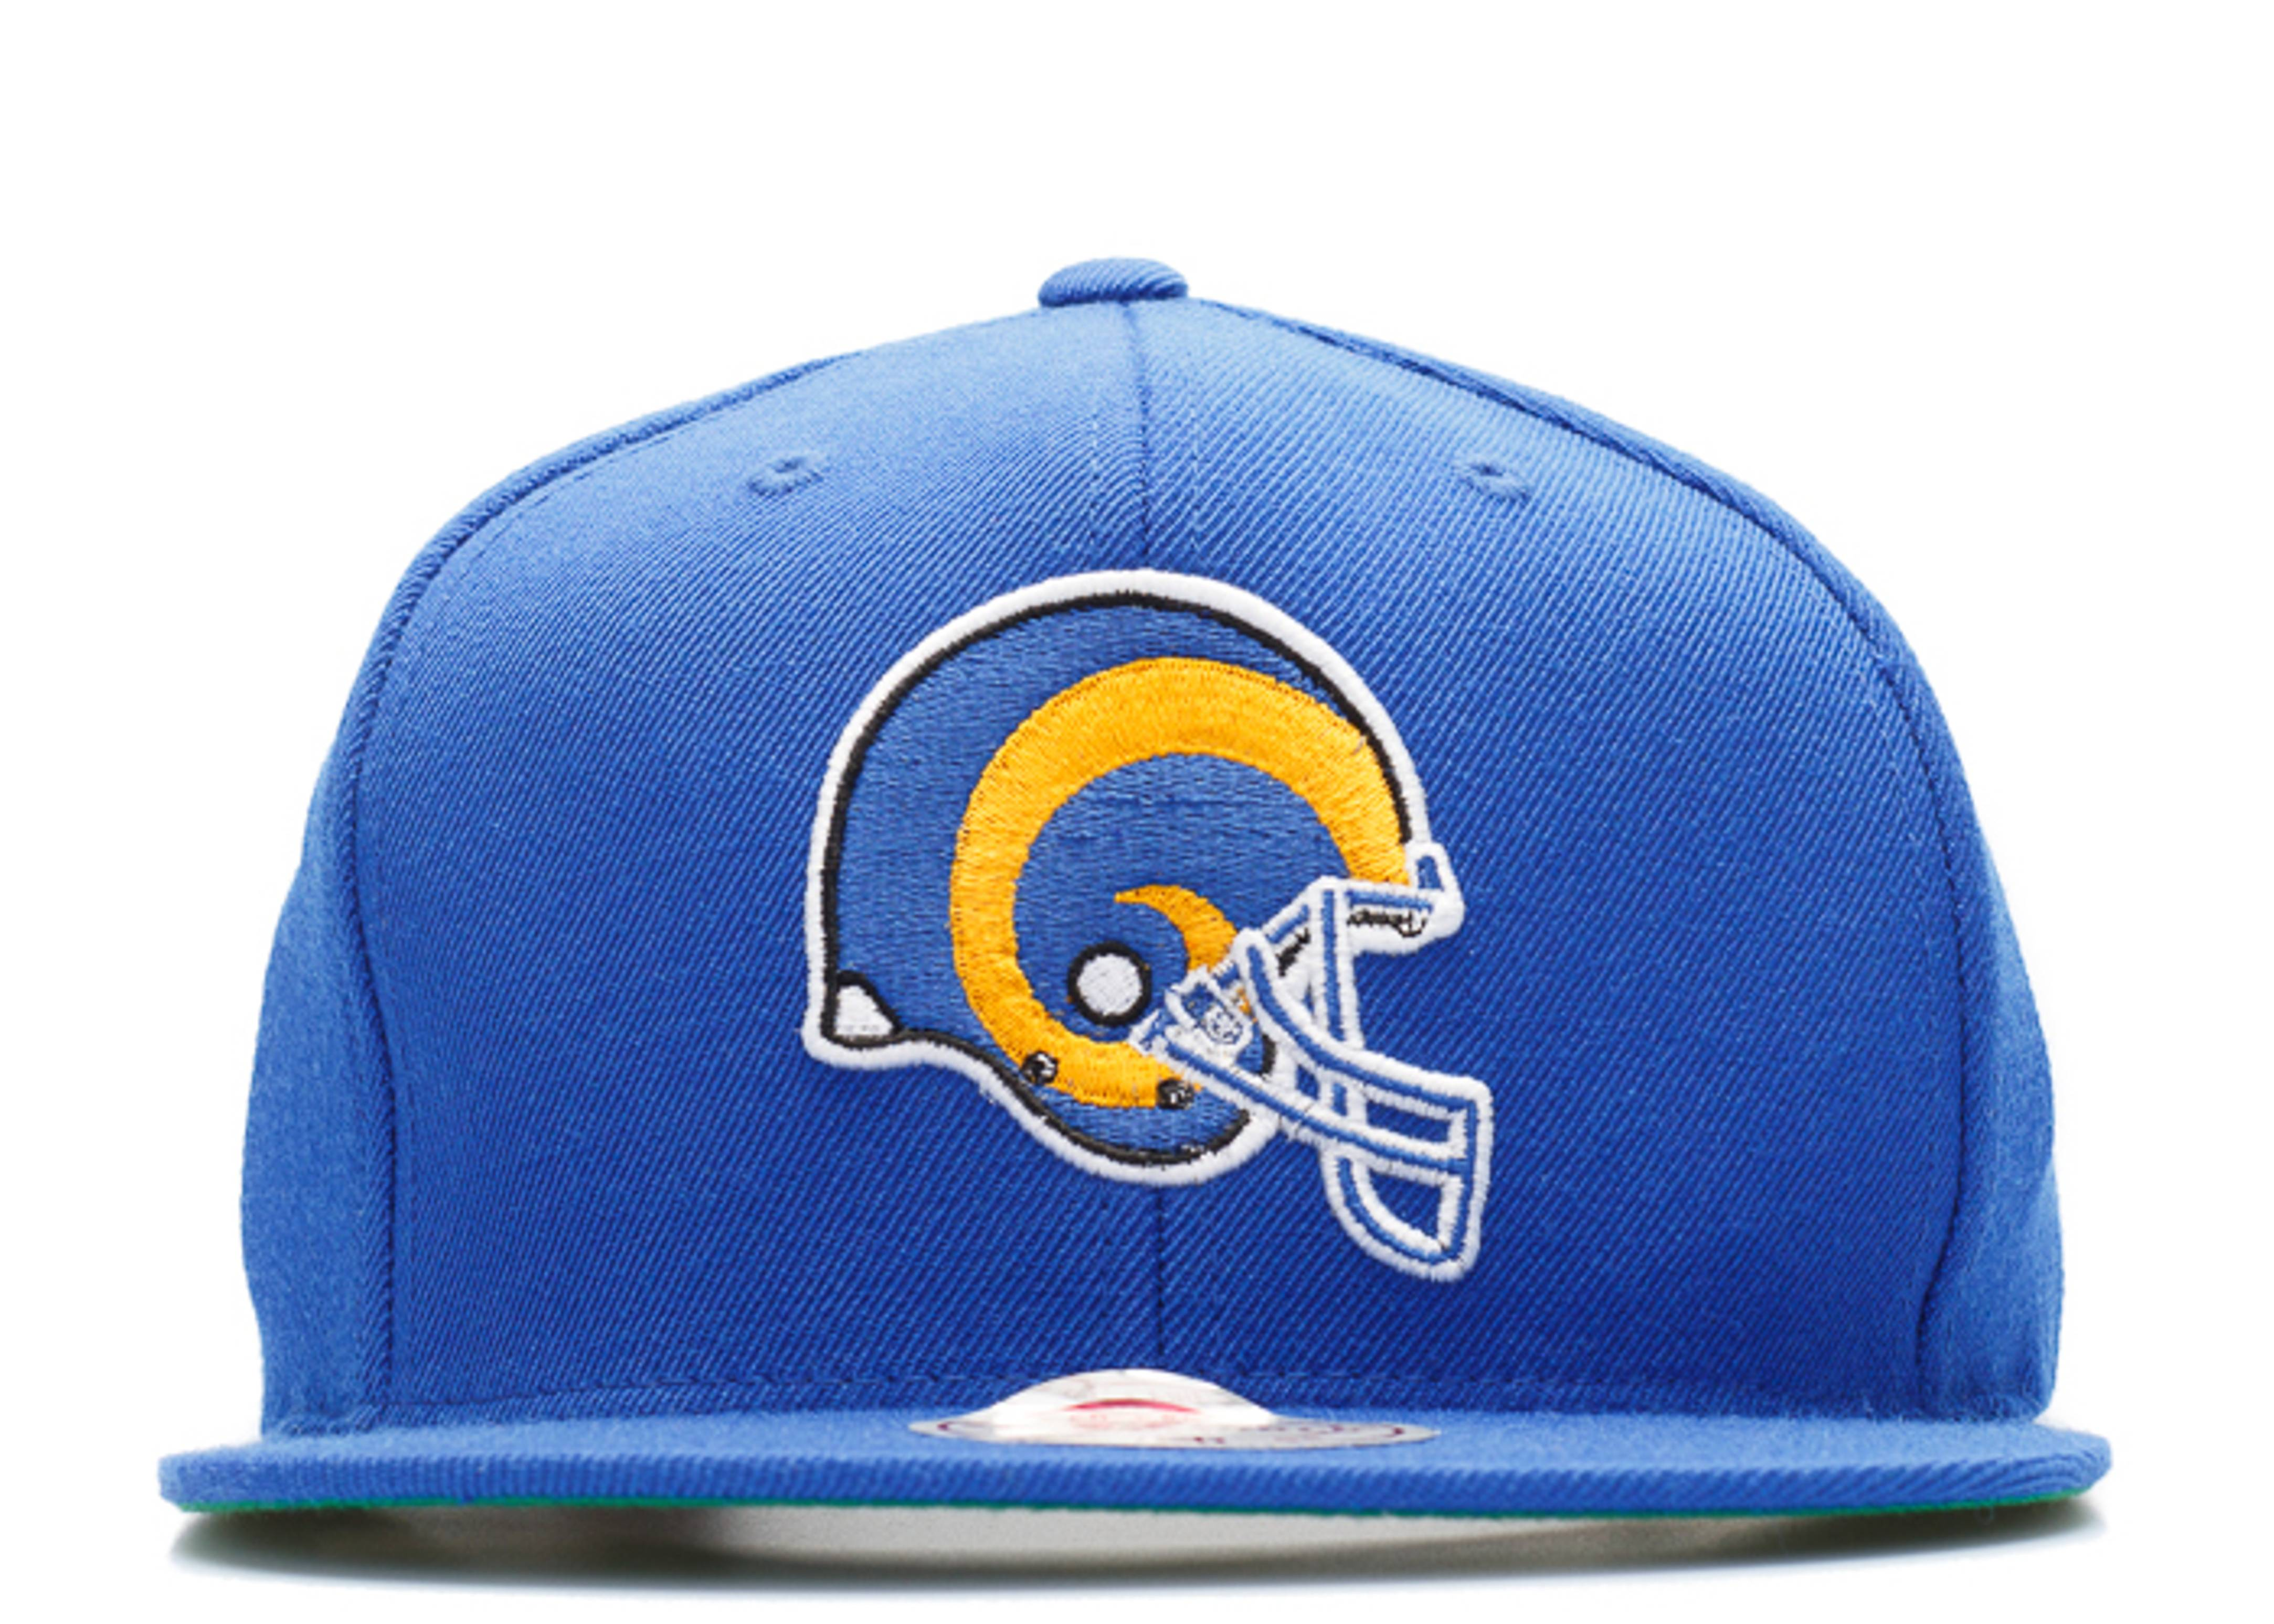 9f9cb162 Los Angeles Rams Snap-back - Mitchell & Ness - nz97tpc6laram - royal ...